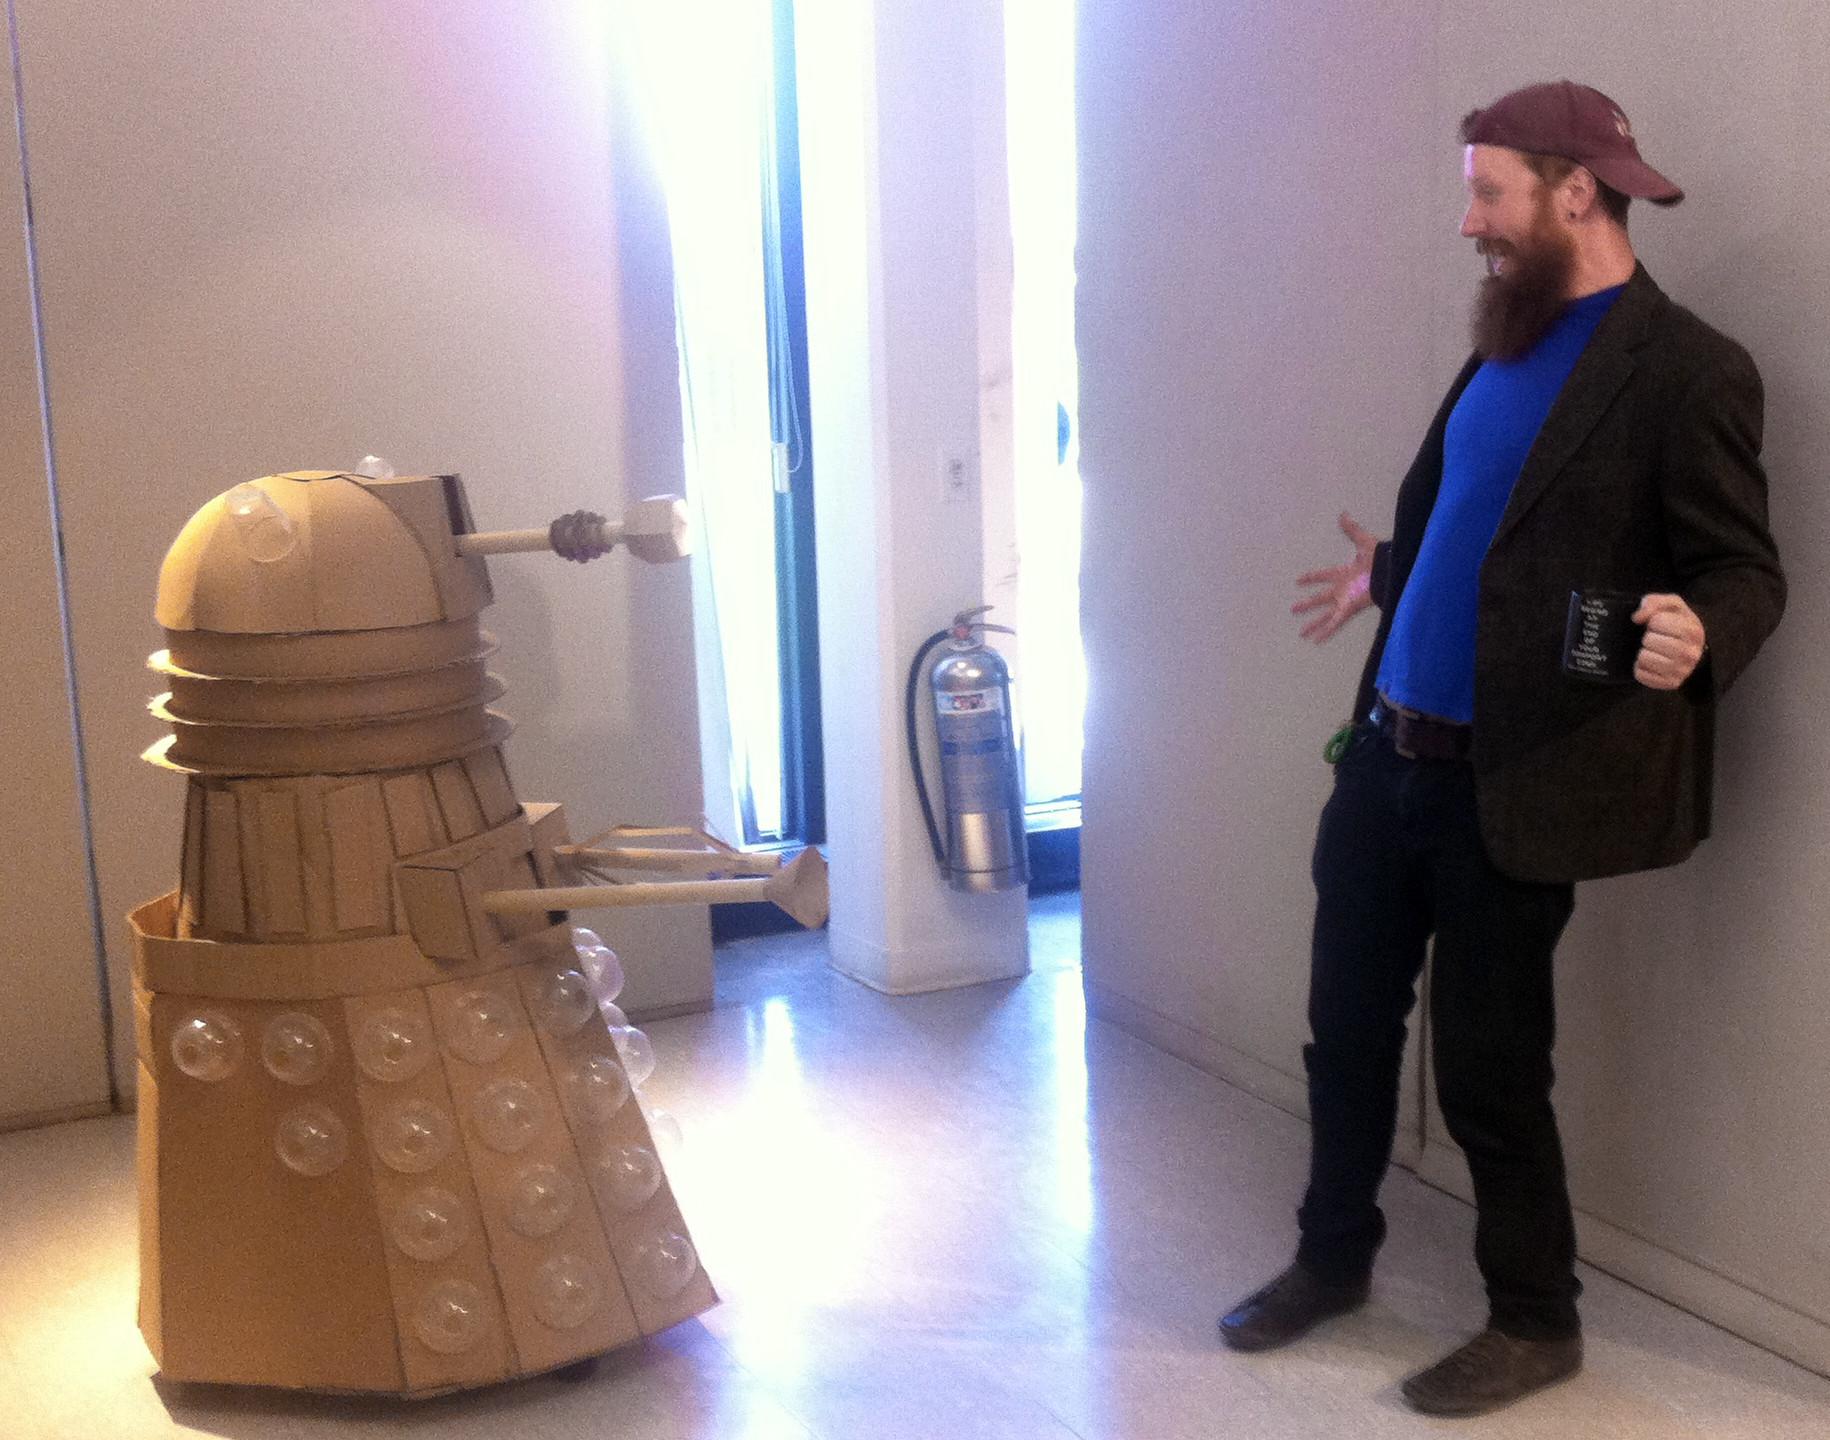 Derek and Dalek